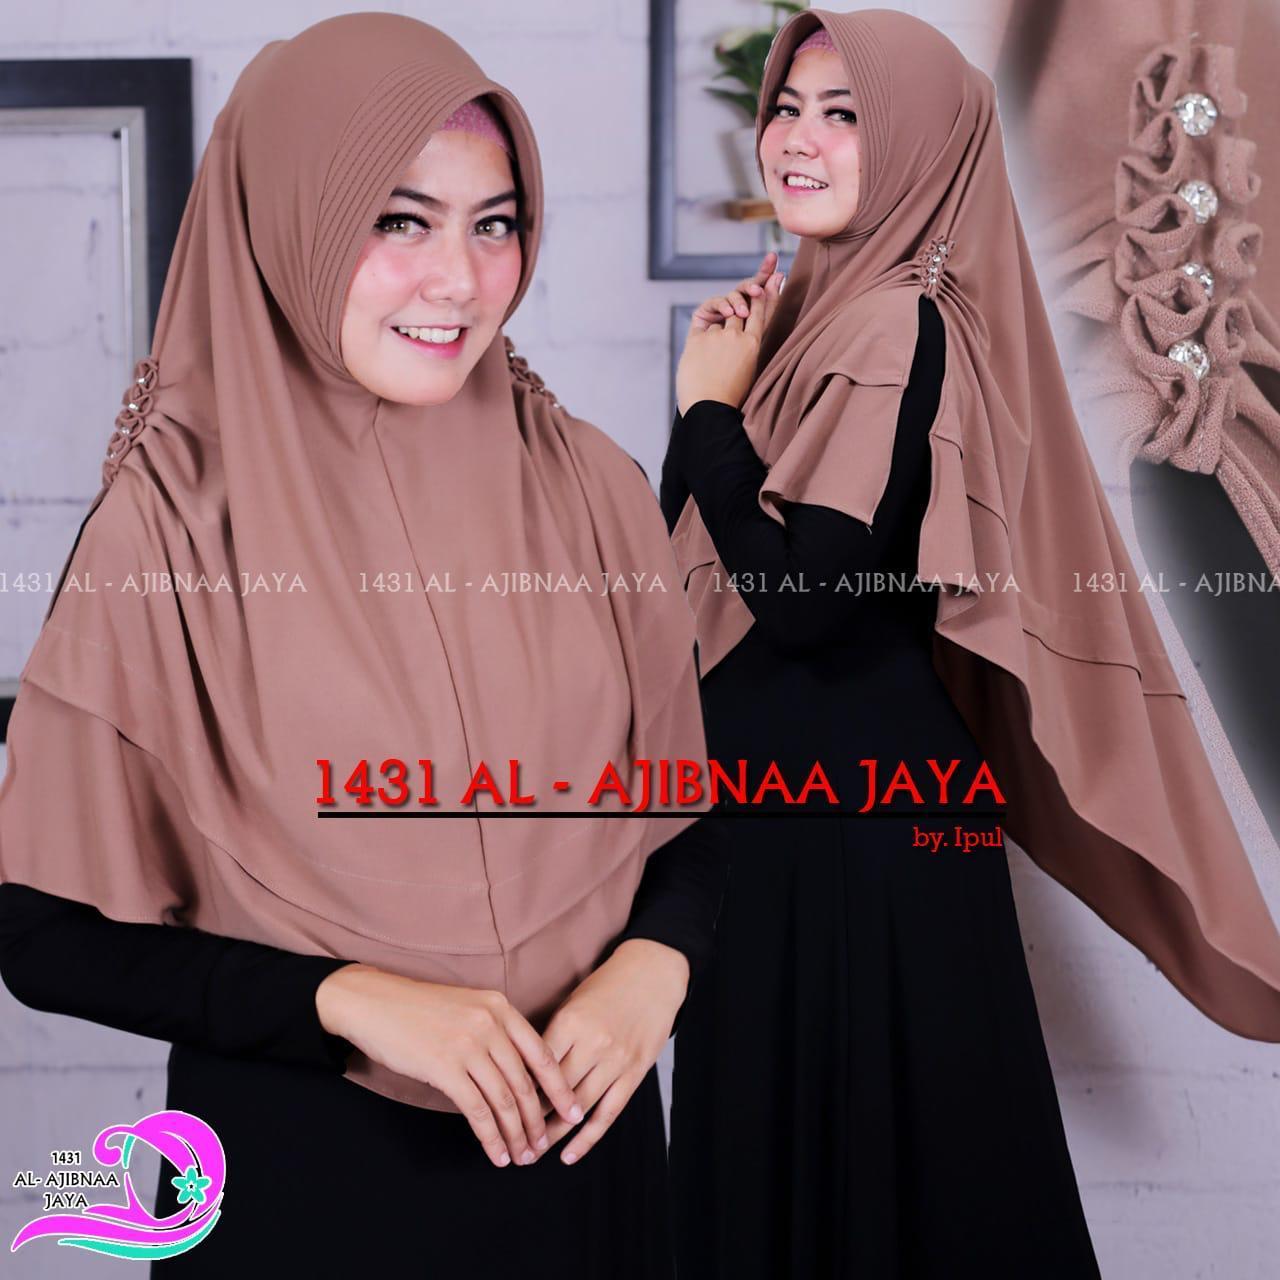 Hijab Wanita / Fashion Muslim Hijab Instan  / Jilbab Terbaru Bahan Jersy / Kerudung Terbaru / Atasan Muslimah - Andeska